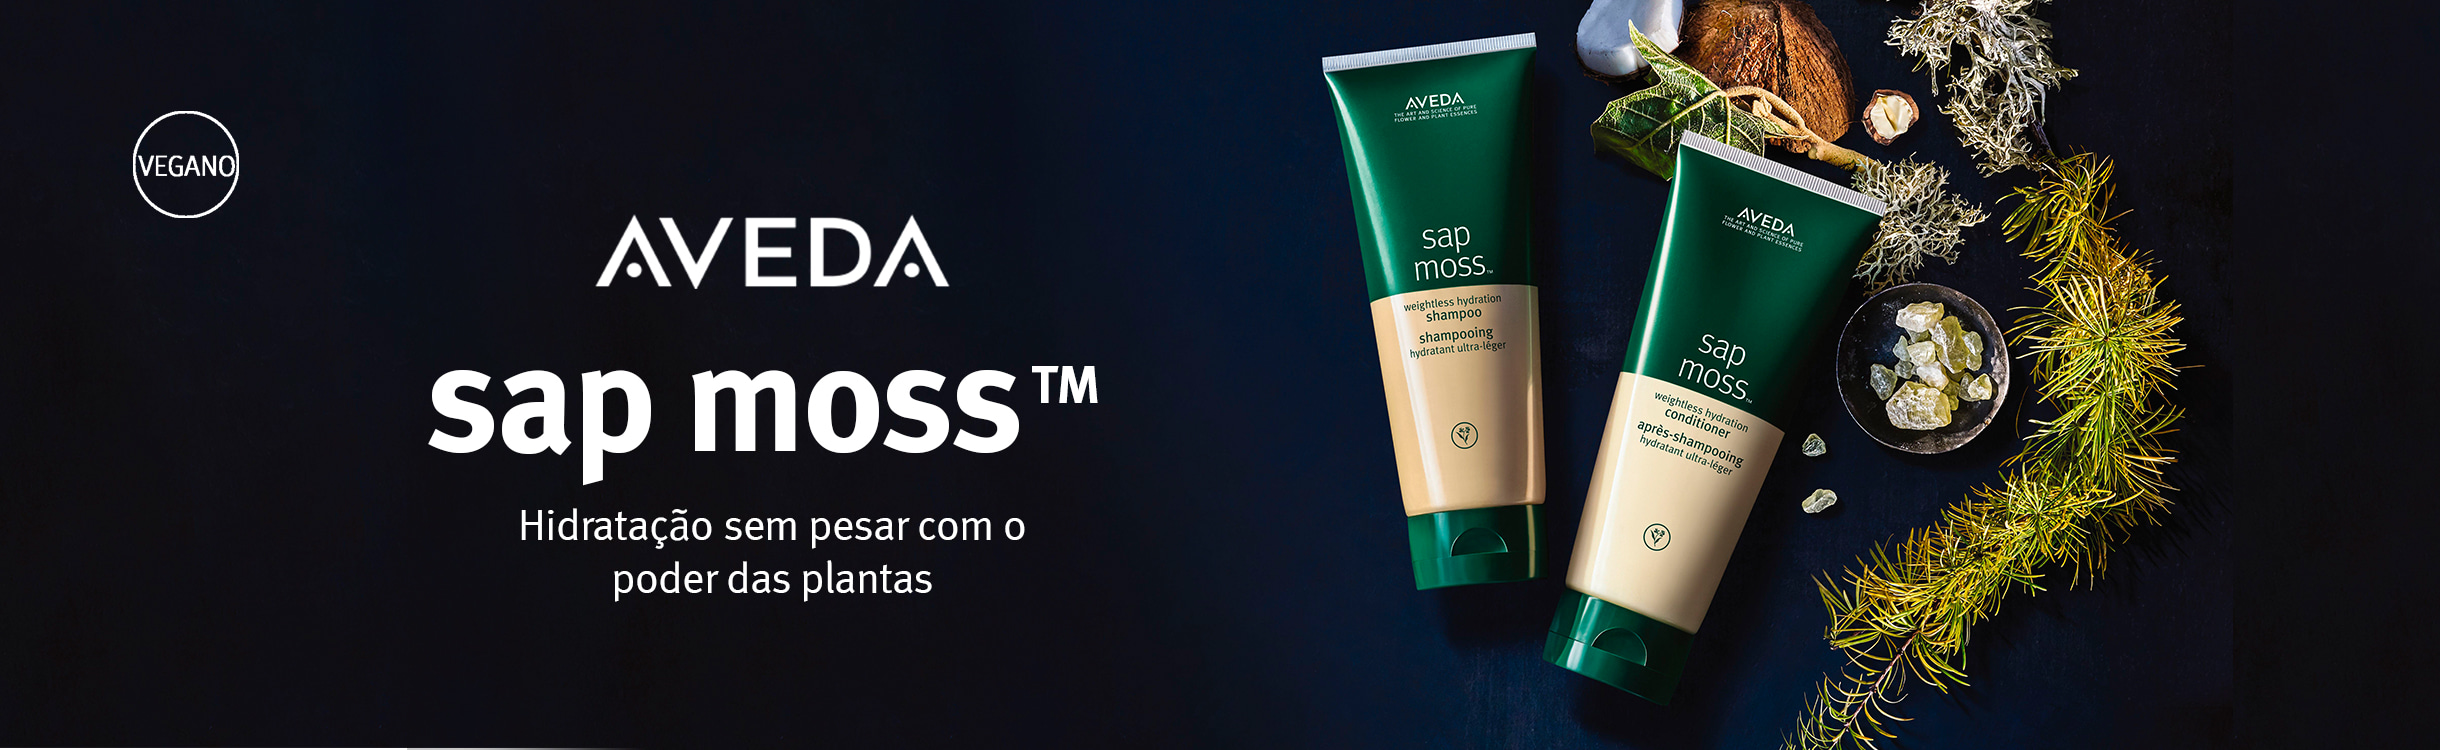 Aveda Sap Moss